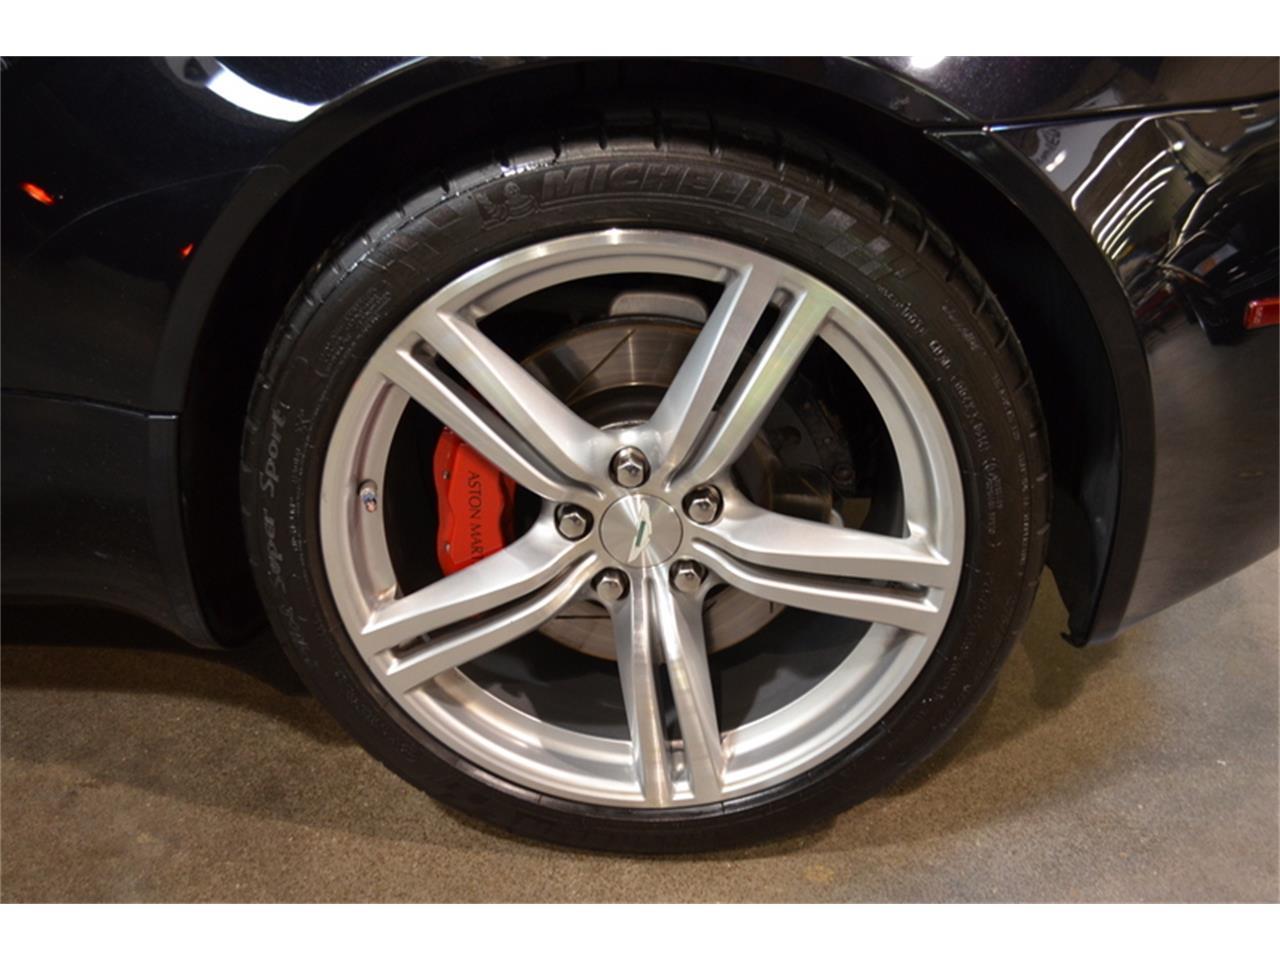 2009 Aston Martin V8 Vantage Roadster For Sale In